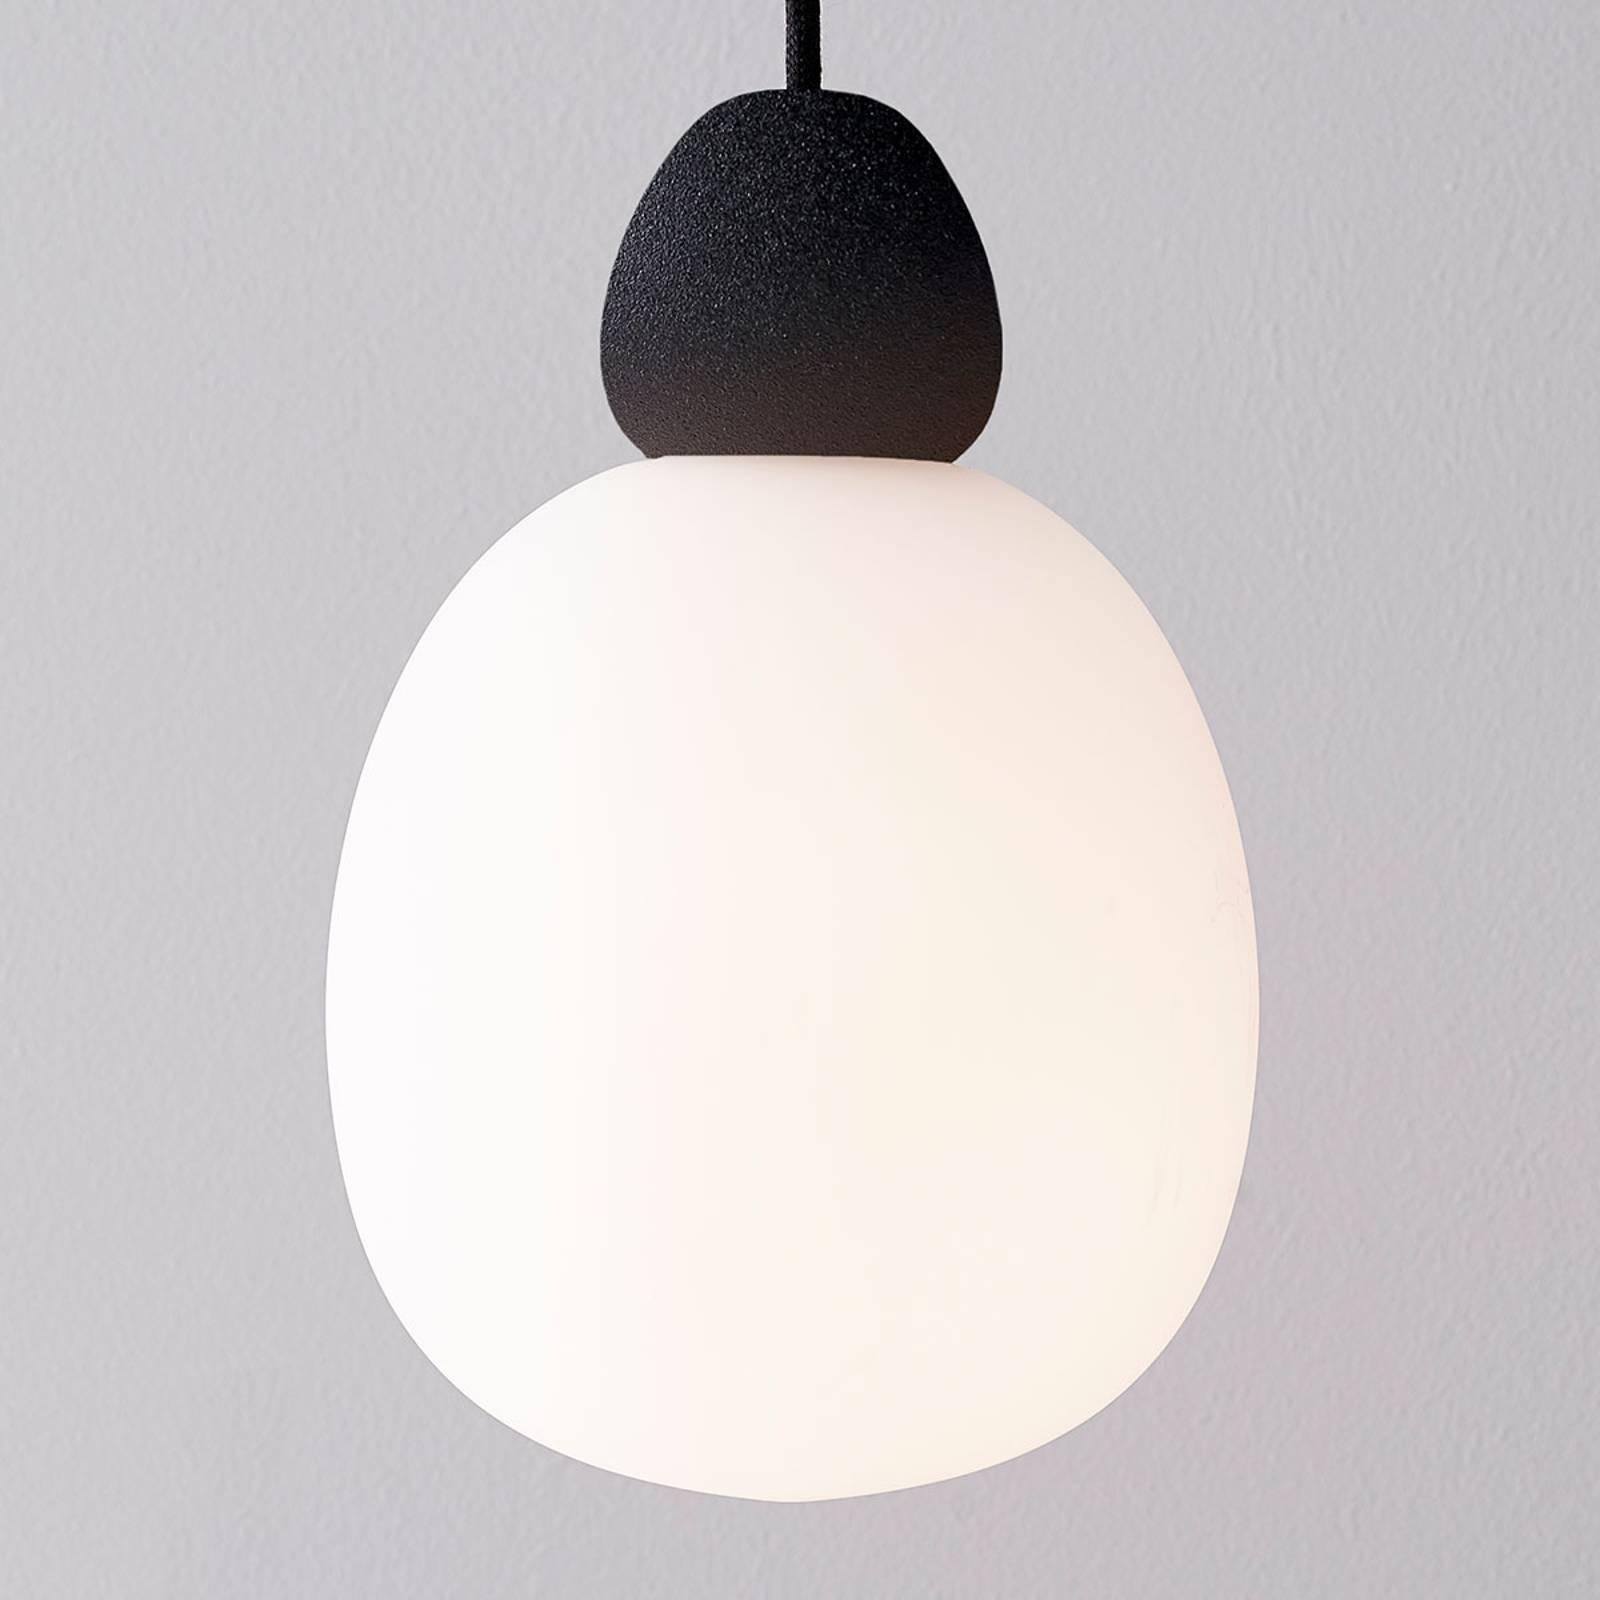 Glazen hanglamp Buddy ophanging zwart